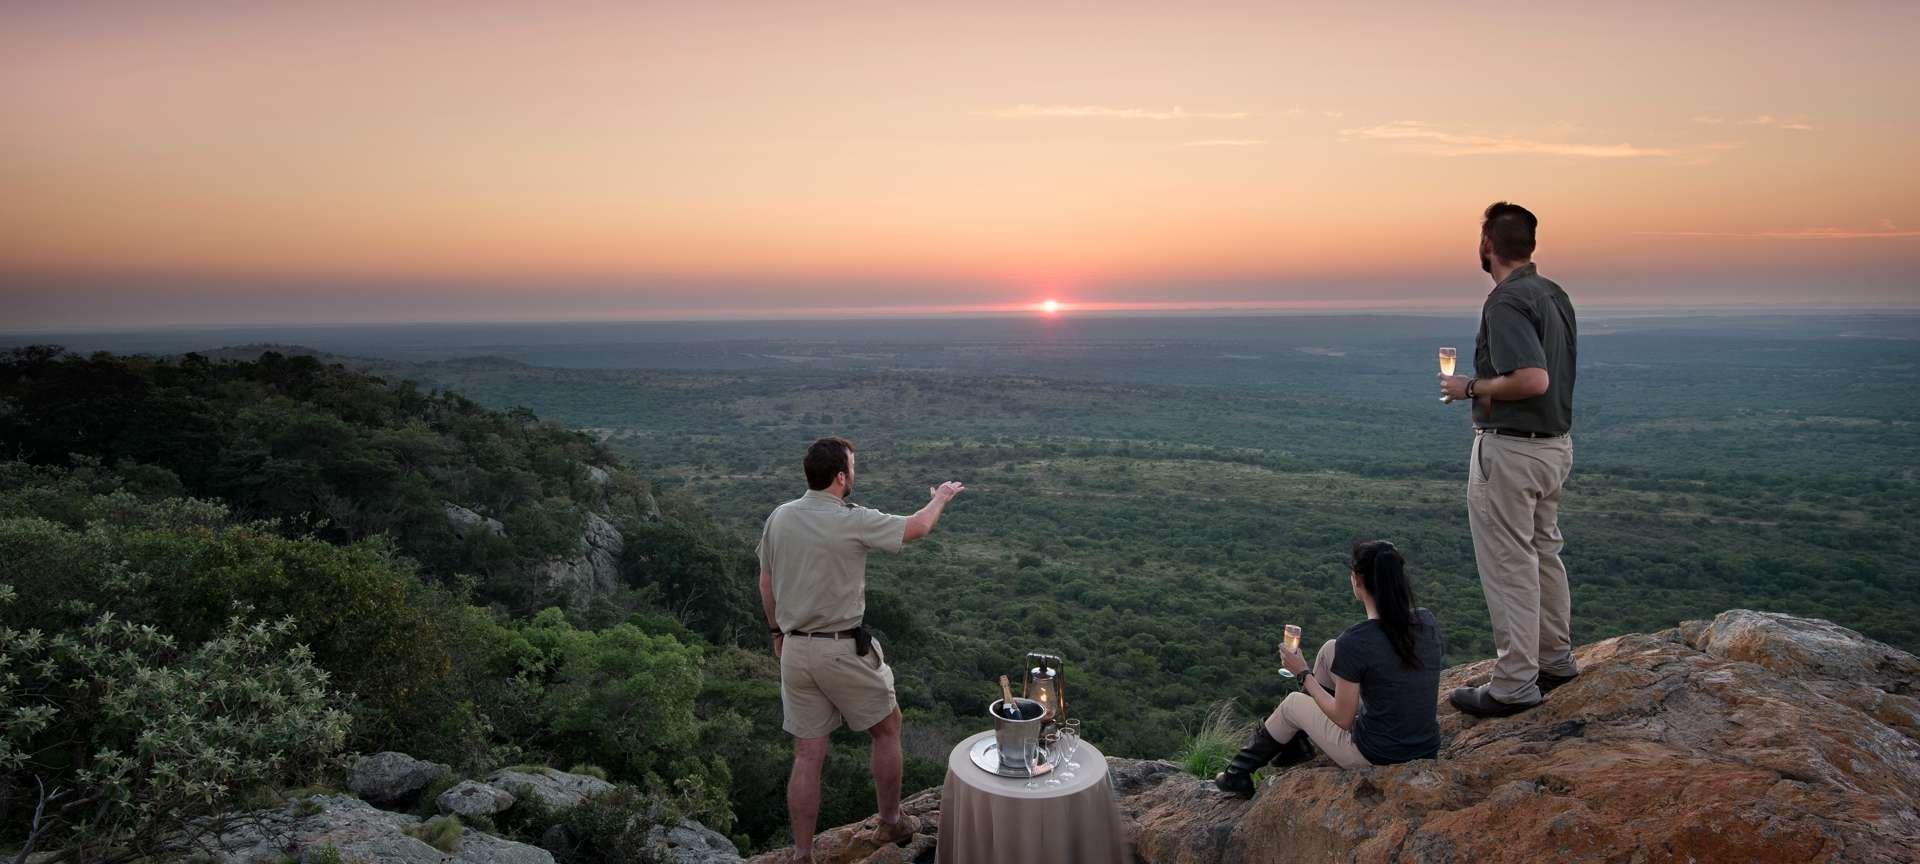 Safari honeymoons in South Africa - Africa Wildlife Safaris